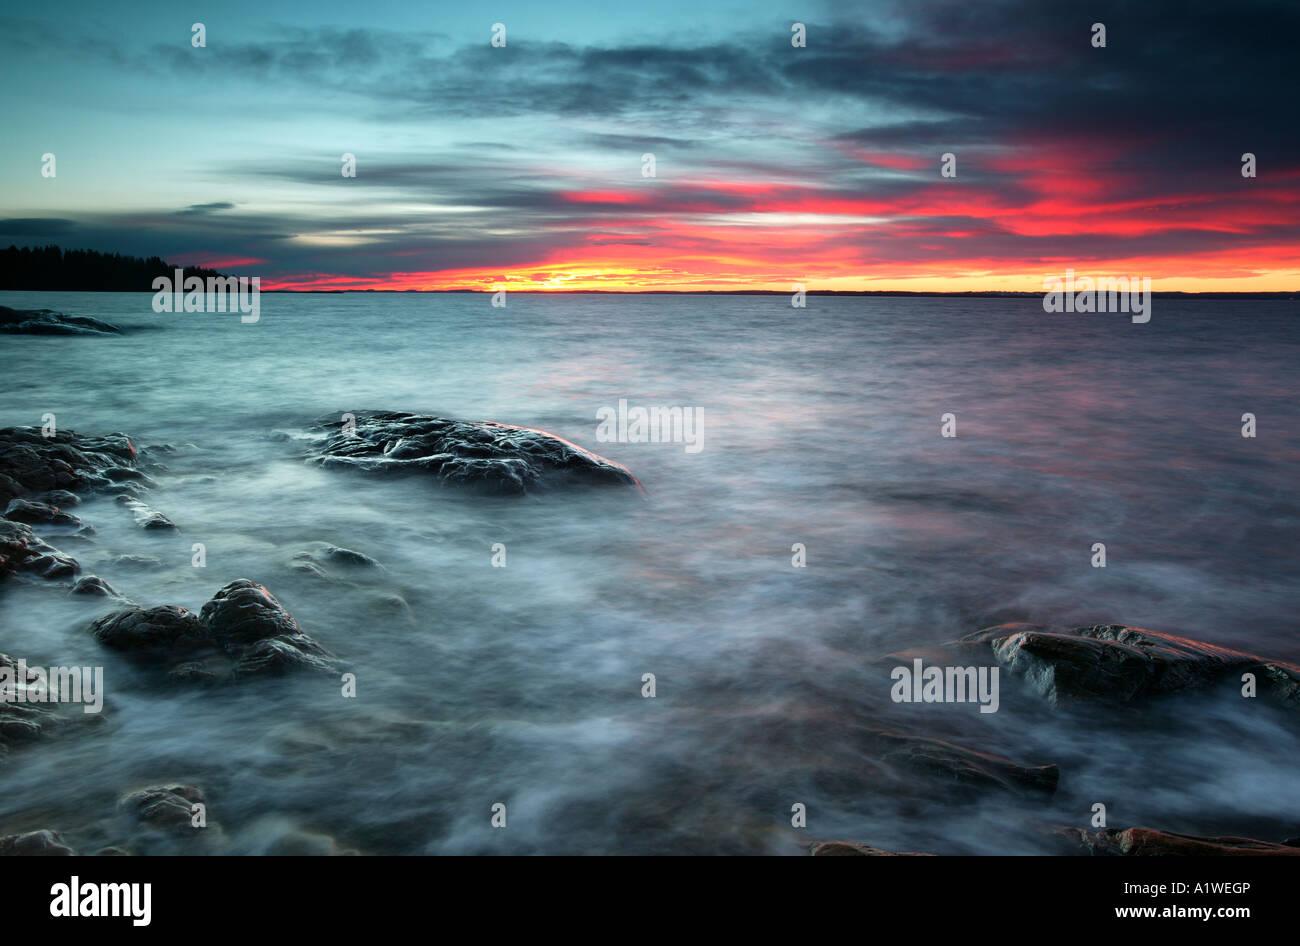 Beautiful sunset at Larkollen by the Oslofjord, Østfold fylke, Norway. - Stock Image